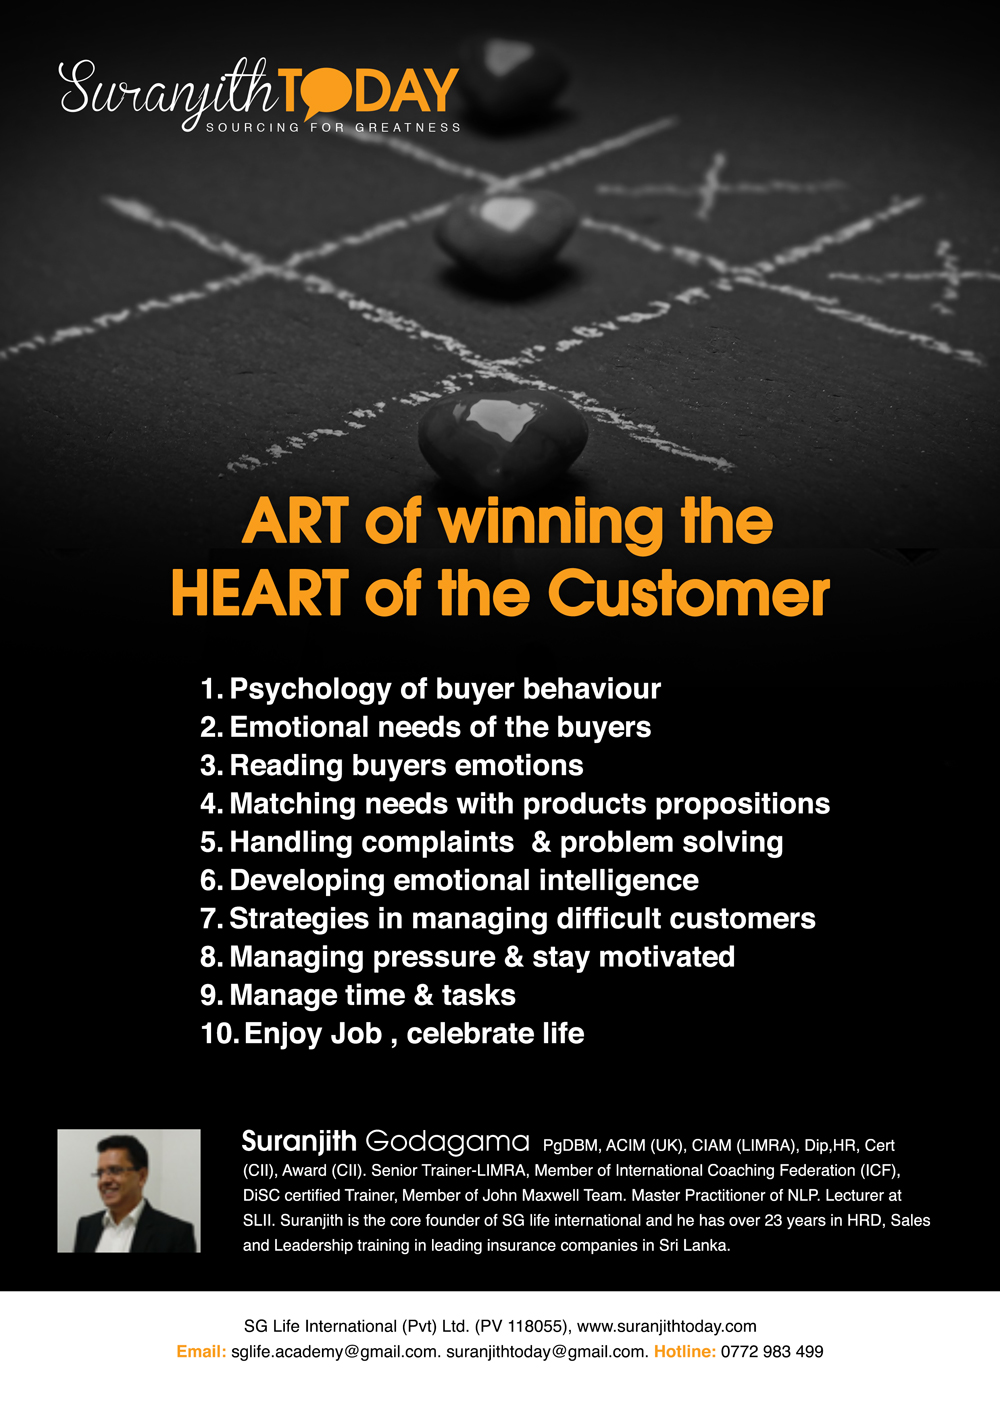 ART of winning the HEART of the Customer